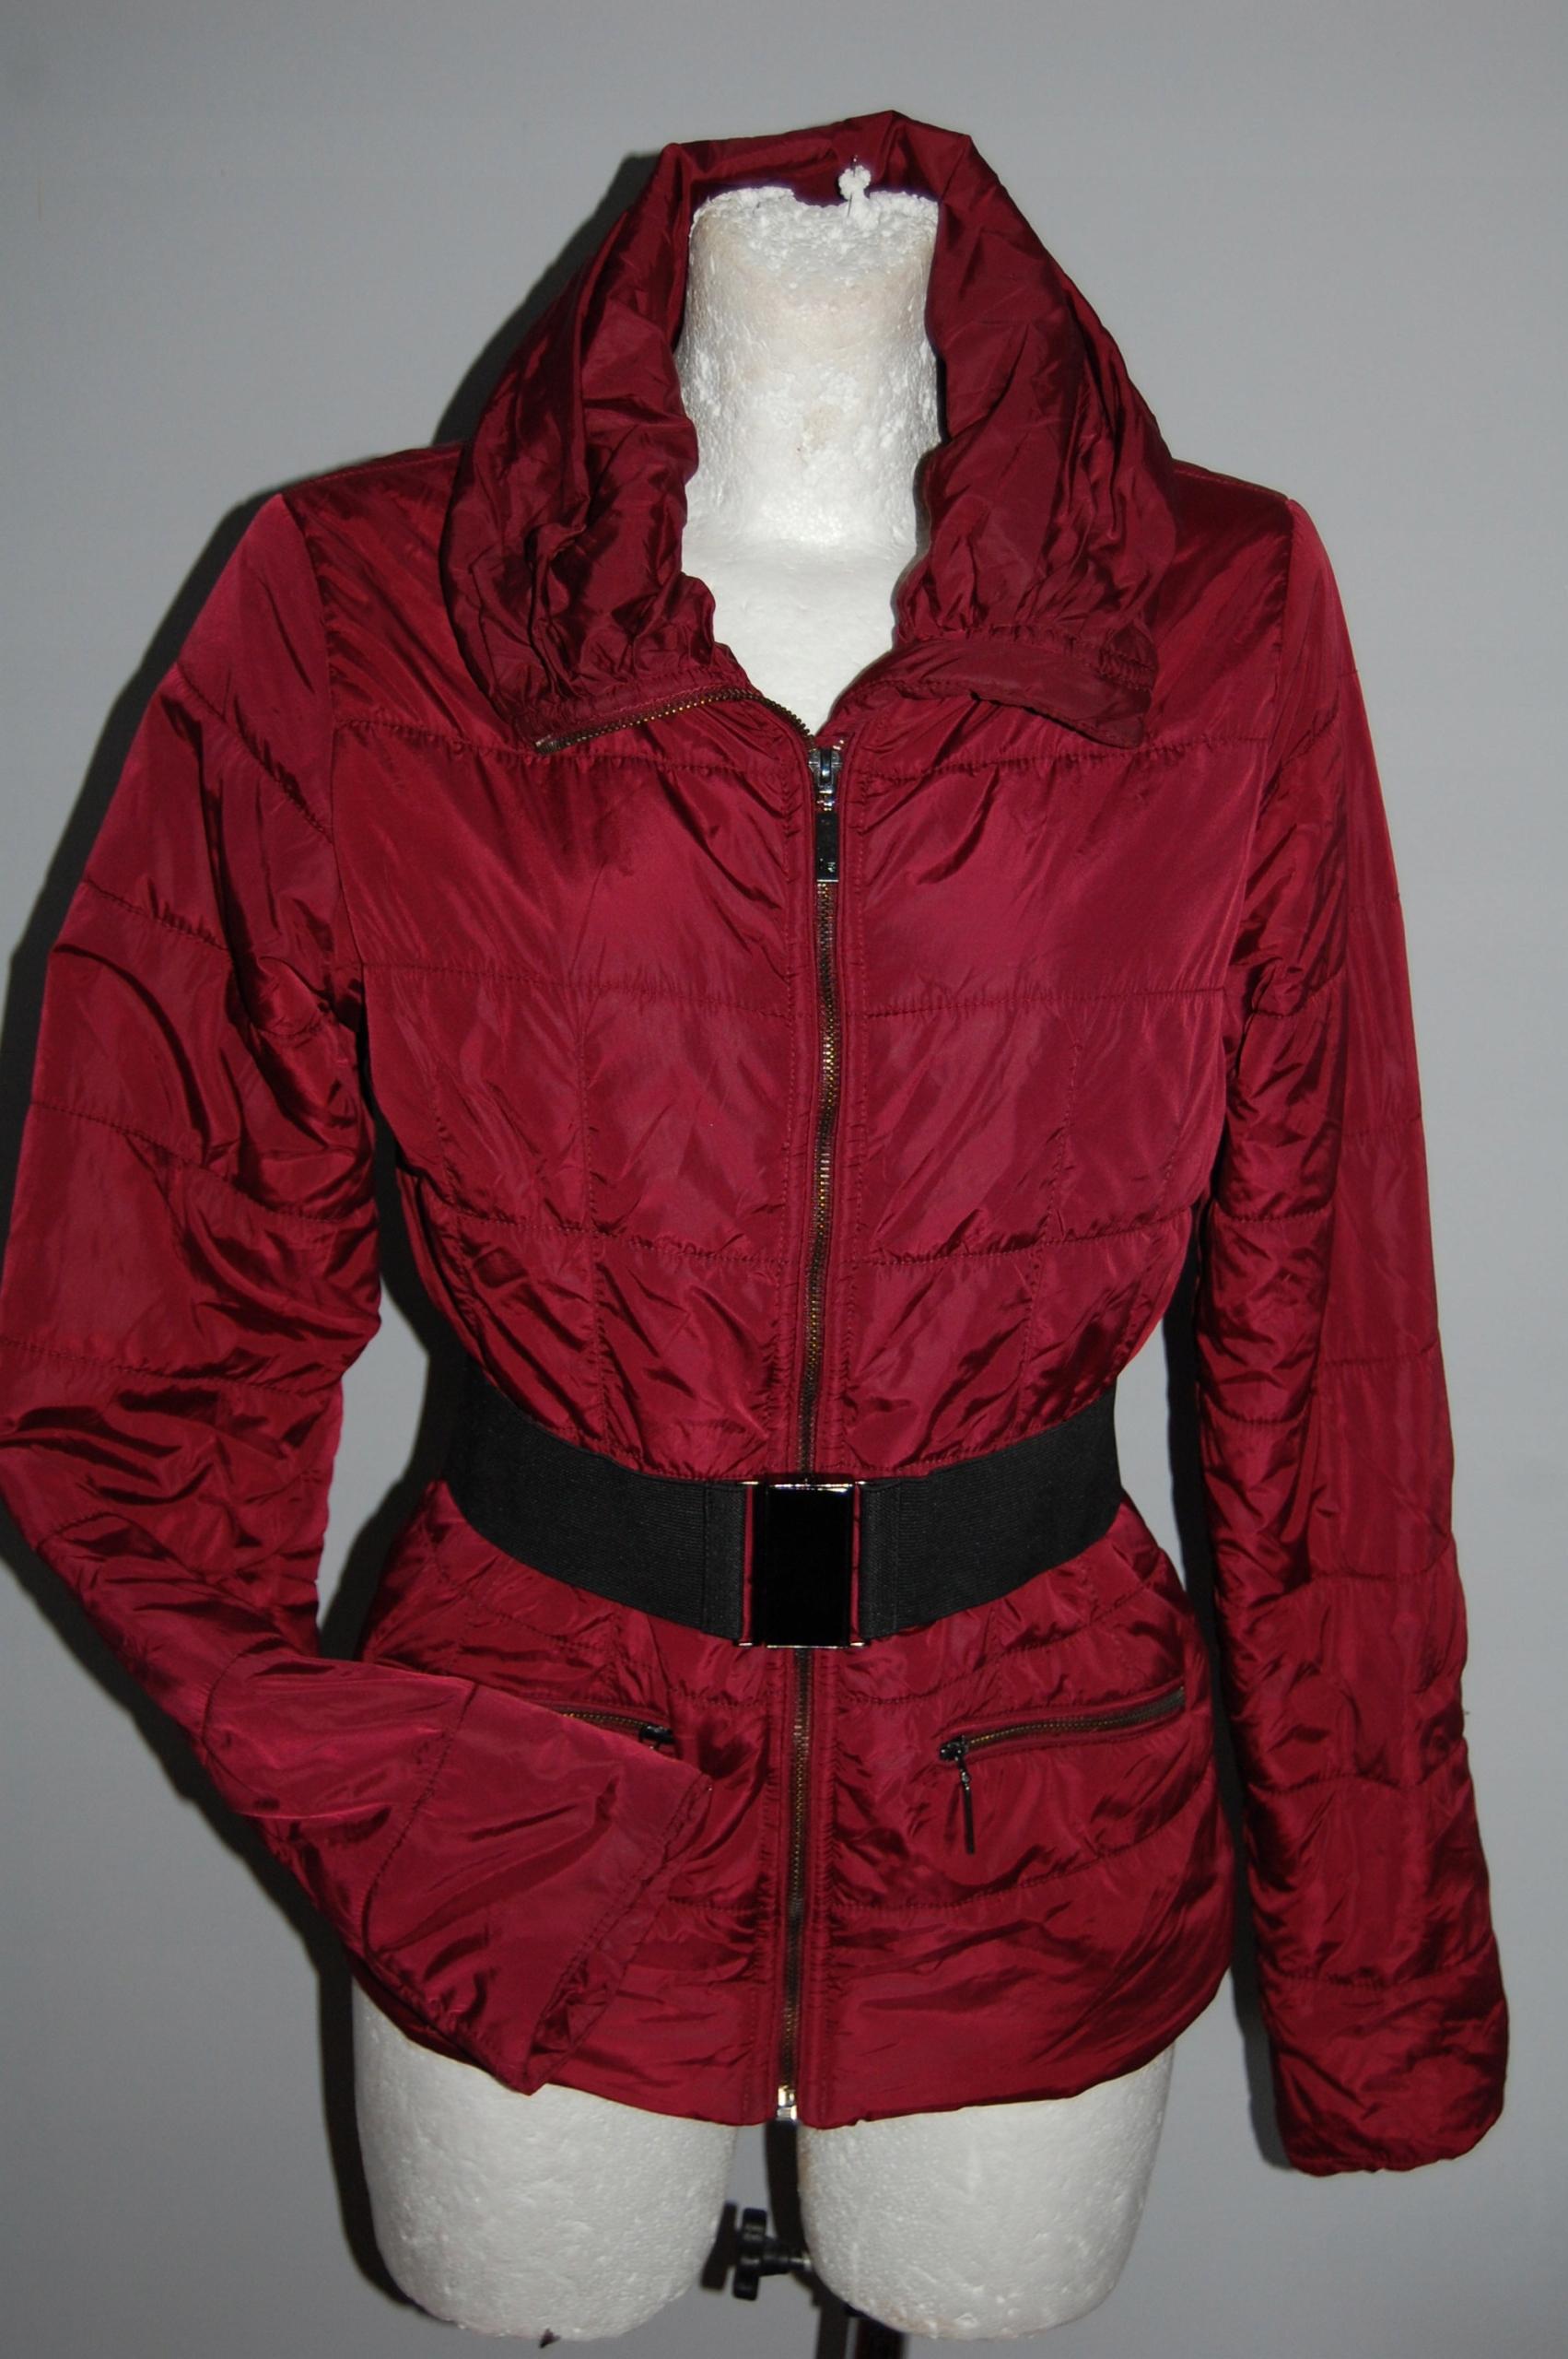 SALE! TOP SECRET bordowa pikowana kurtka 34 XS